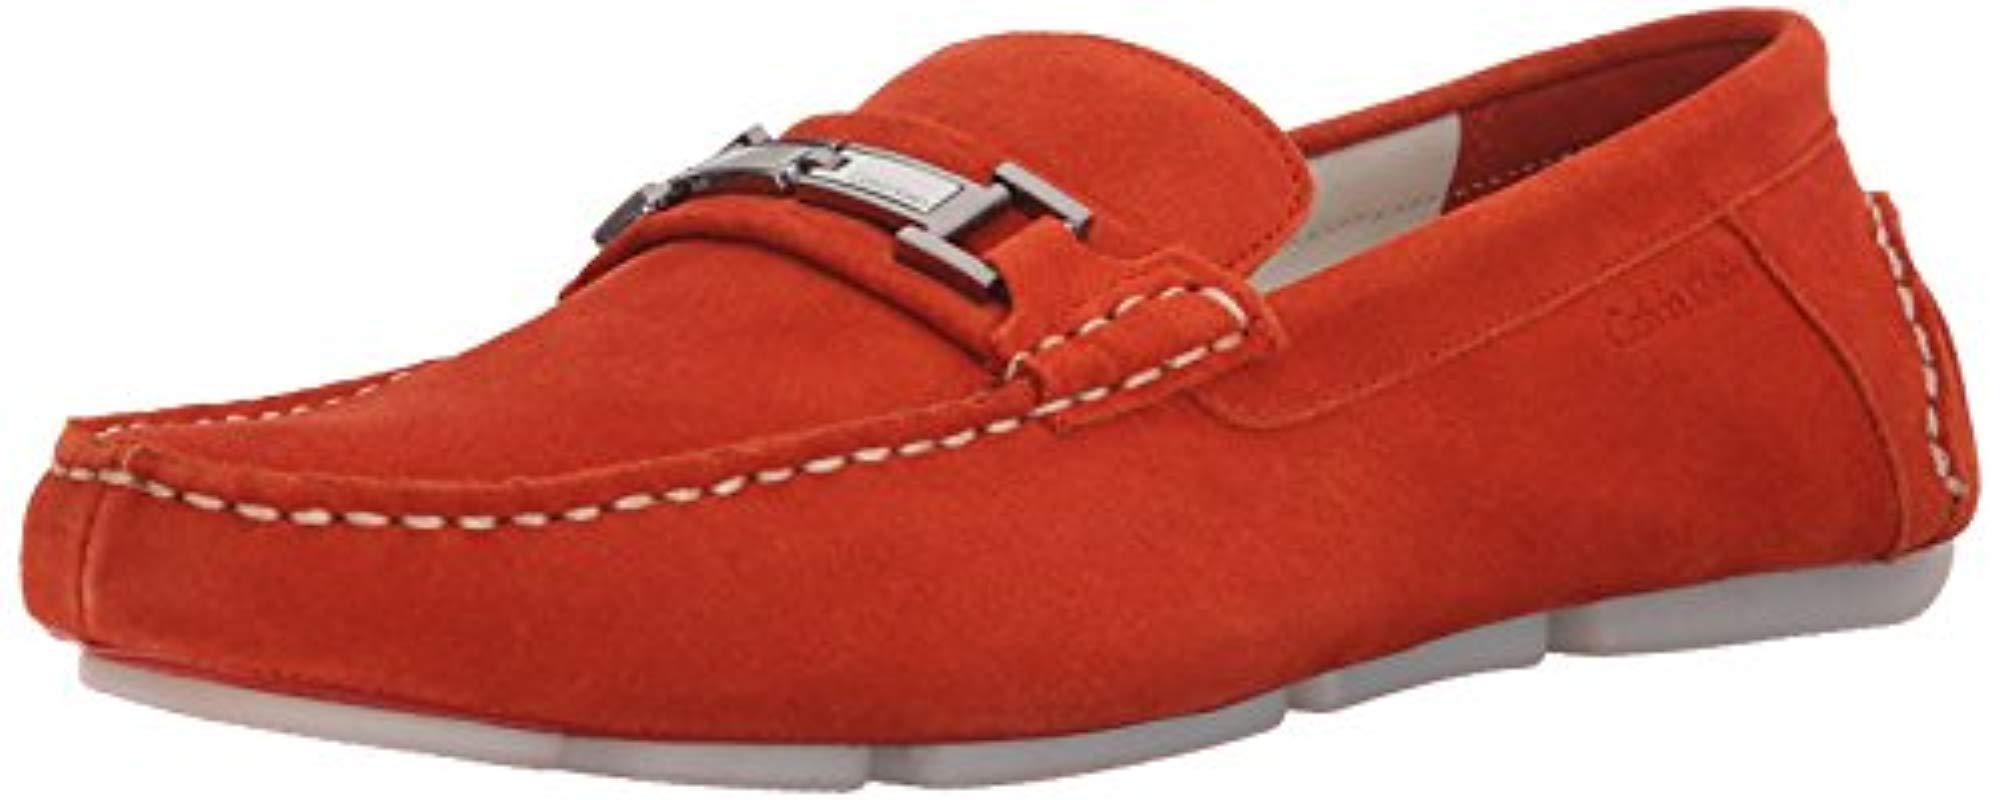 8119624a535 Lyst - Calvin Klein Magnus Slip-on Loafer in Red for Men